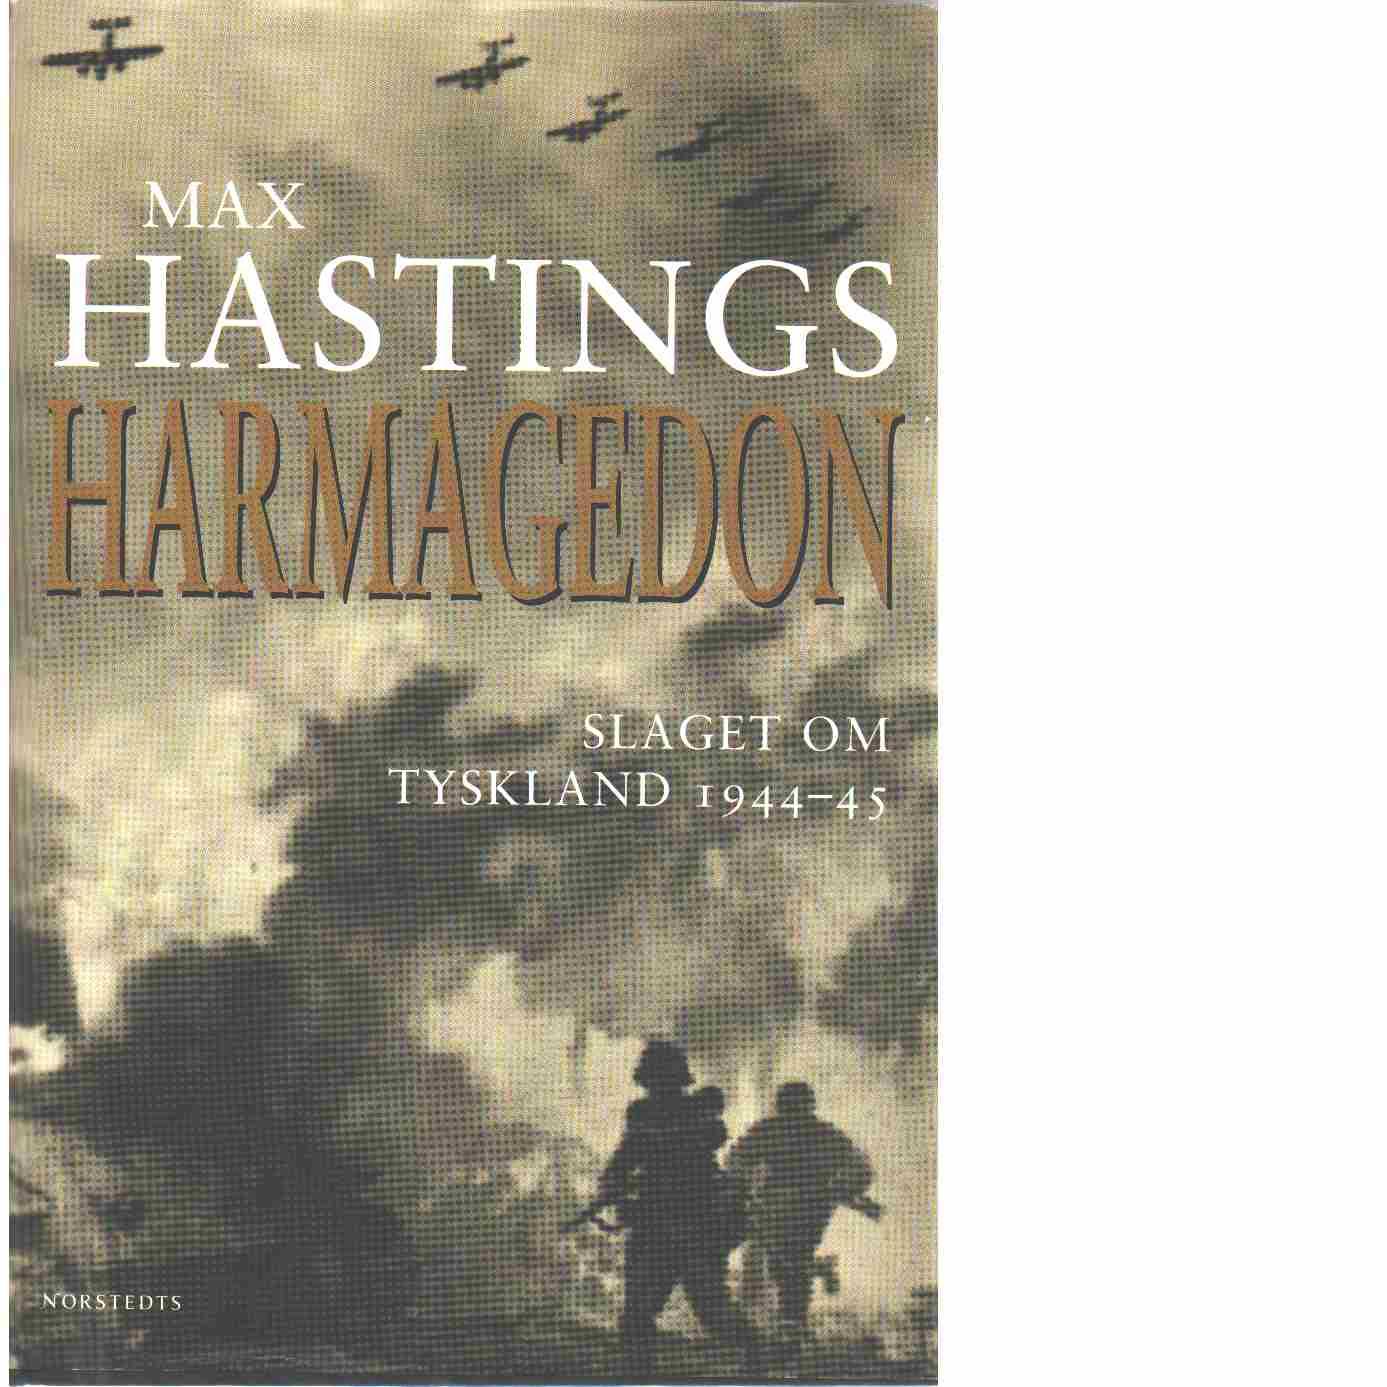 Harmagedon : slaget om Tyskland 1944-45 - Hastings, Max